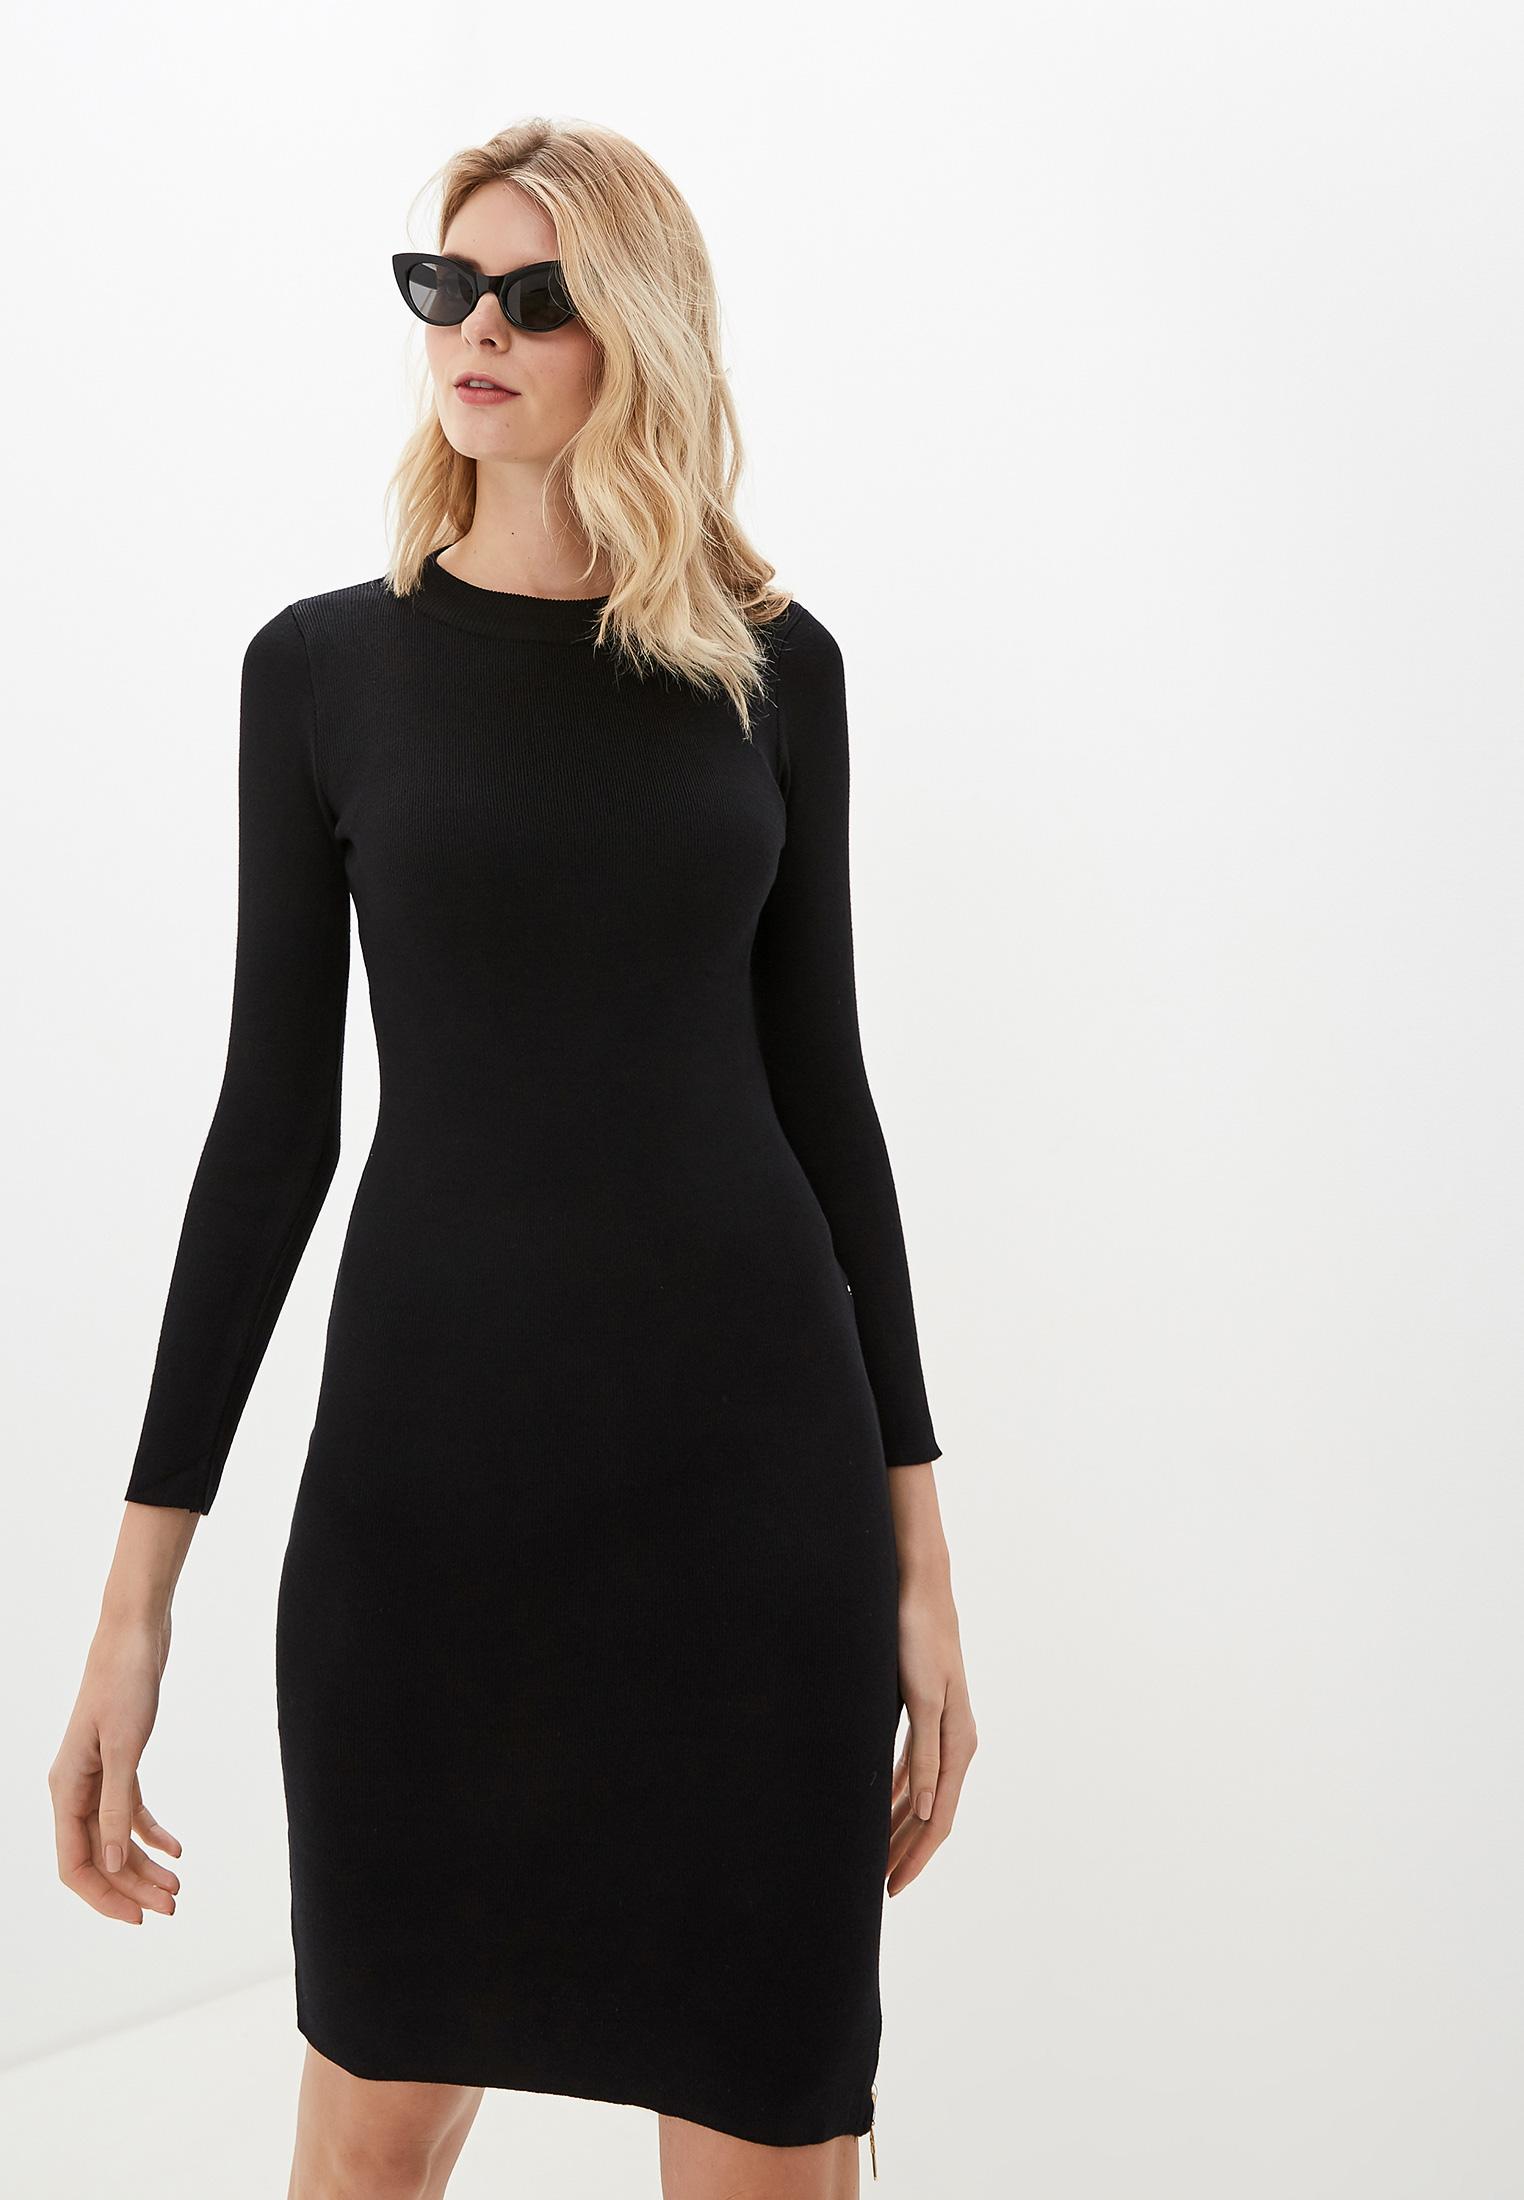 Вязаное платье Liana L324-1